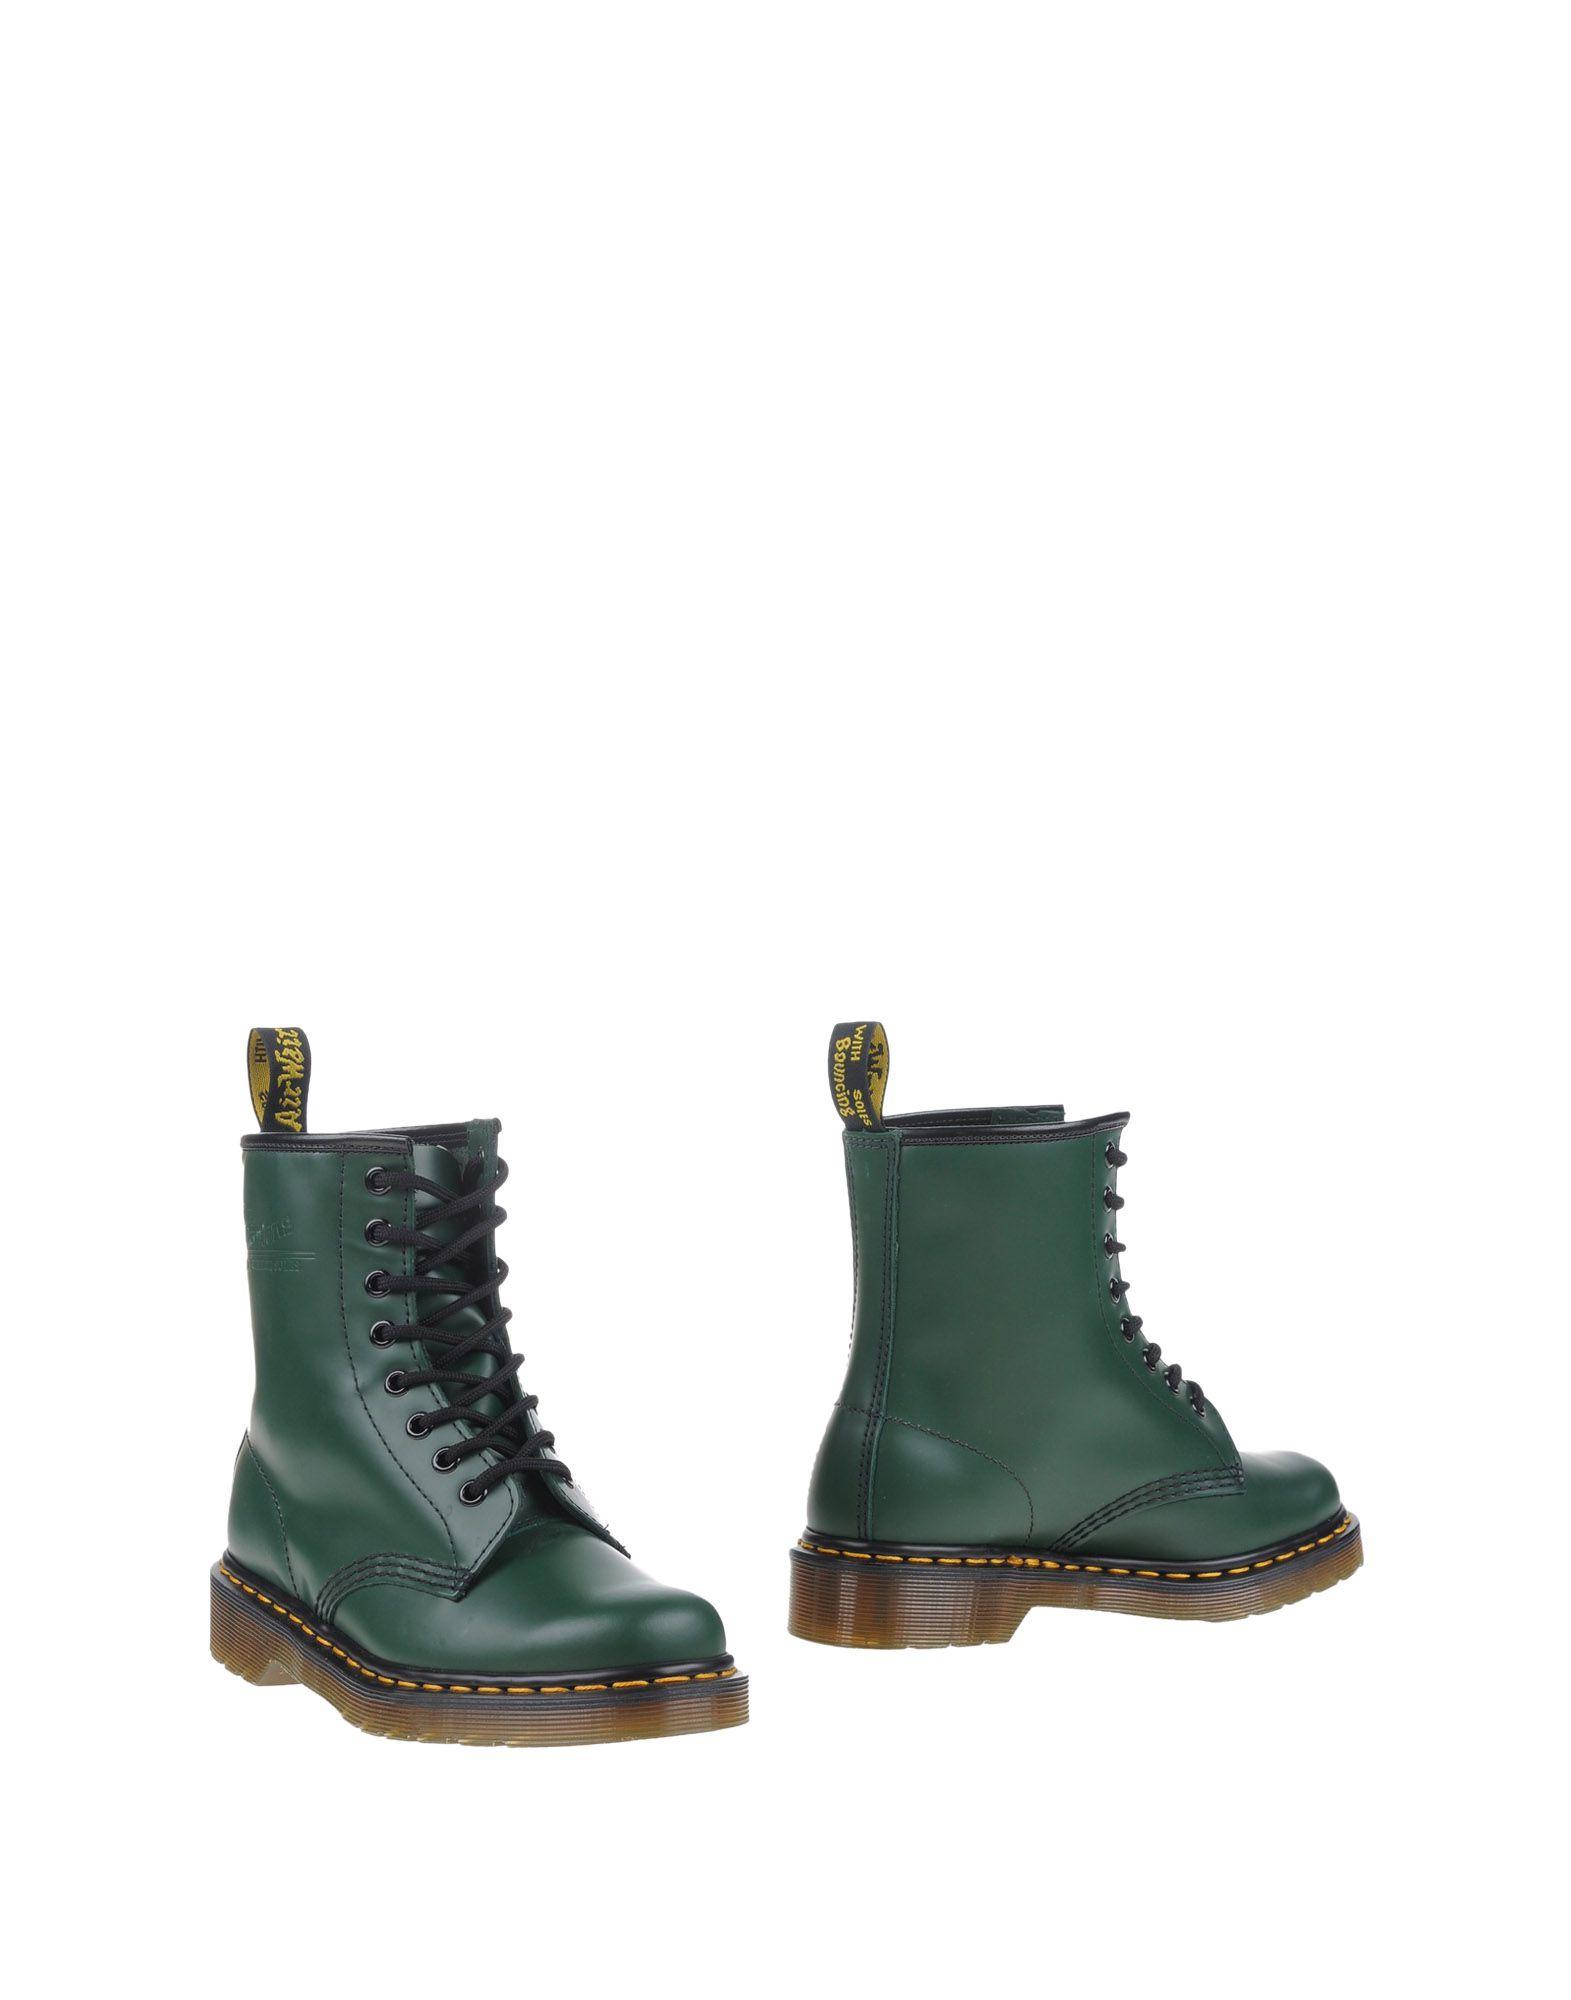 Gut um billige Schuhe Schuhe Schuhe zu tragenDr. Martens Stiefelette Damen  11053359VR e92151